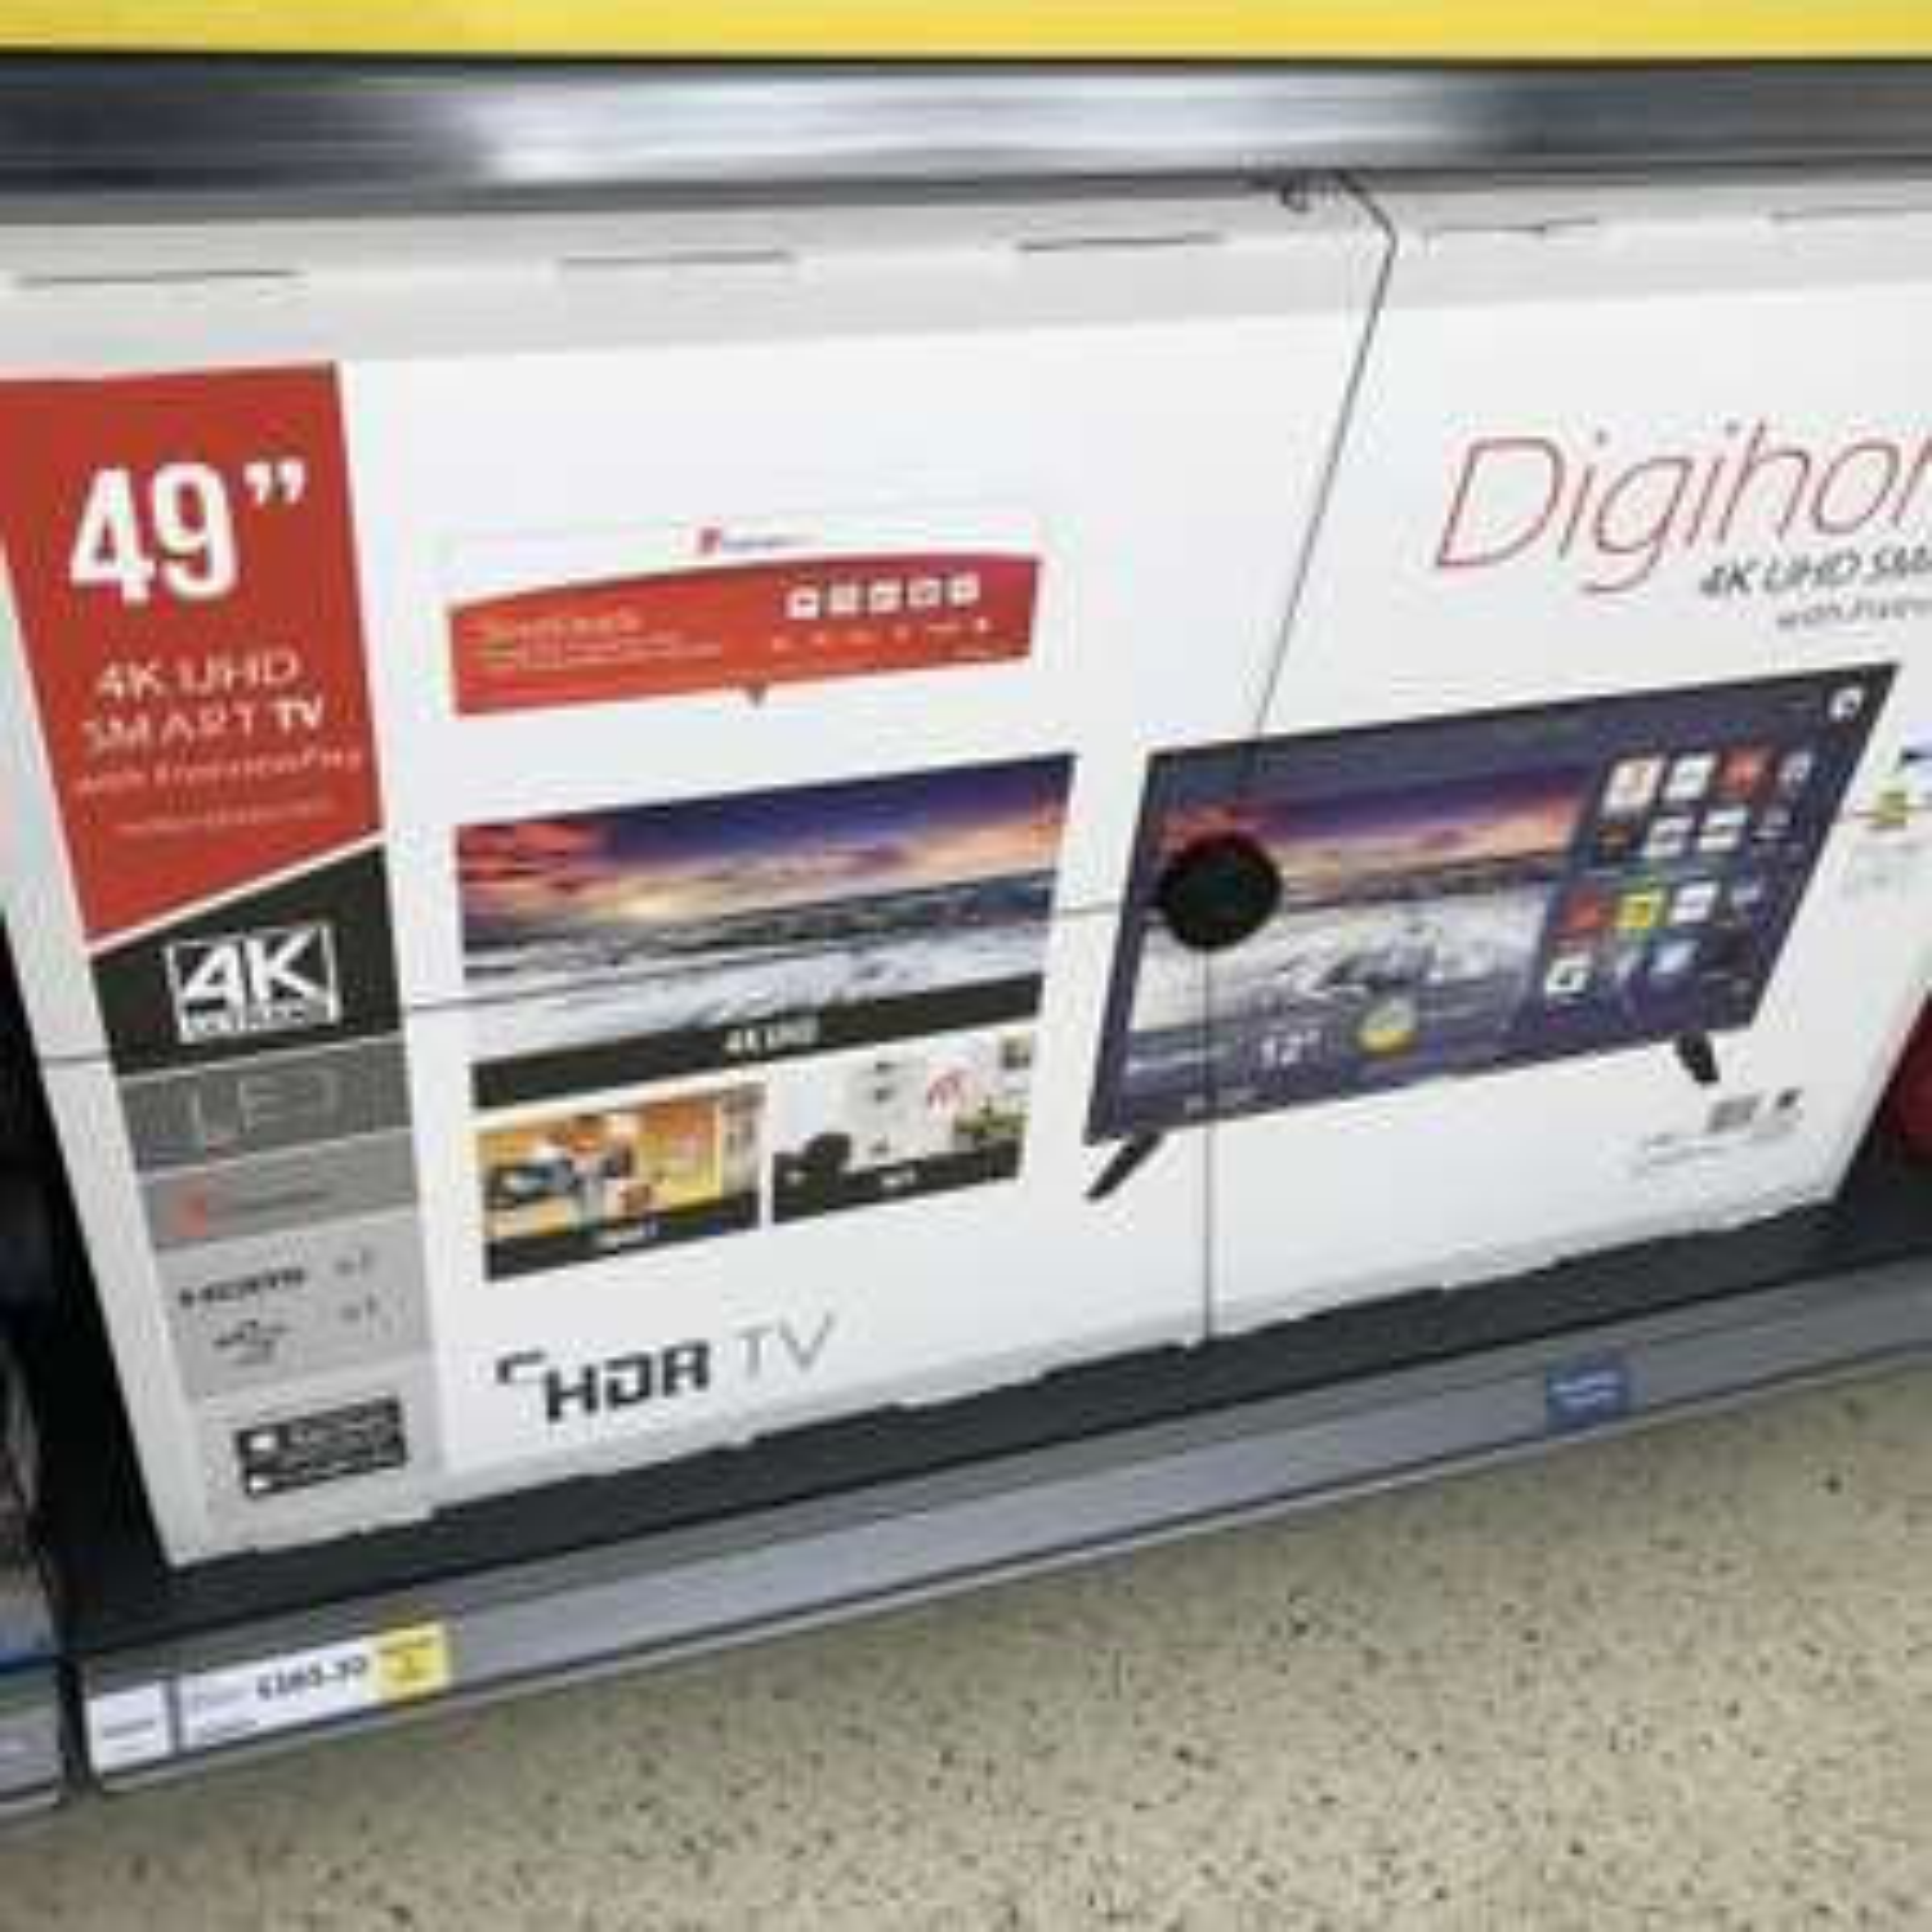 "Digihome 4K 49"" UHD Smart TV. £265.30 instore @ Tesco (Swansea Fforestfach)"